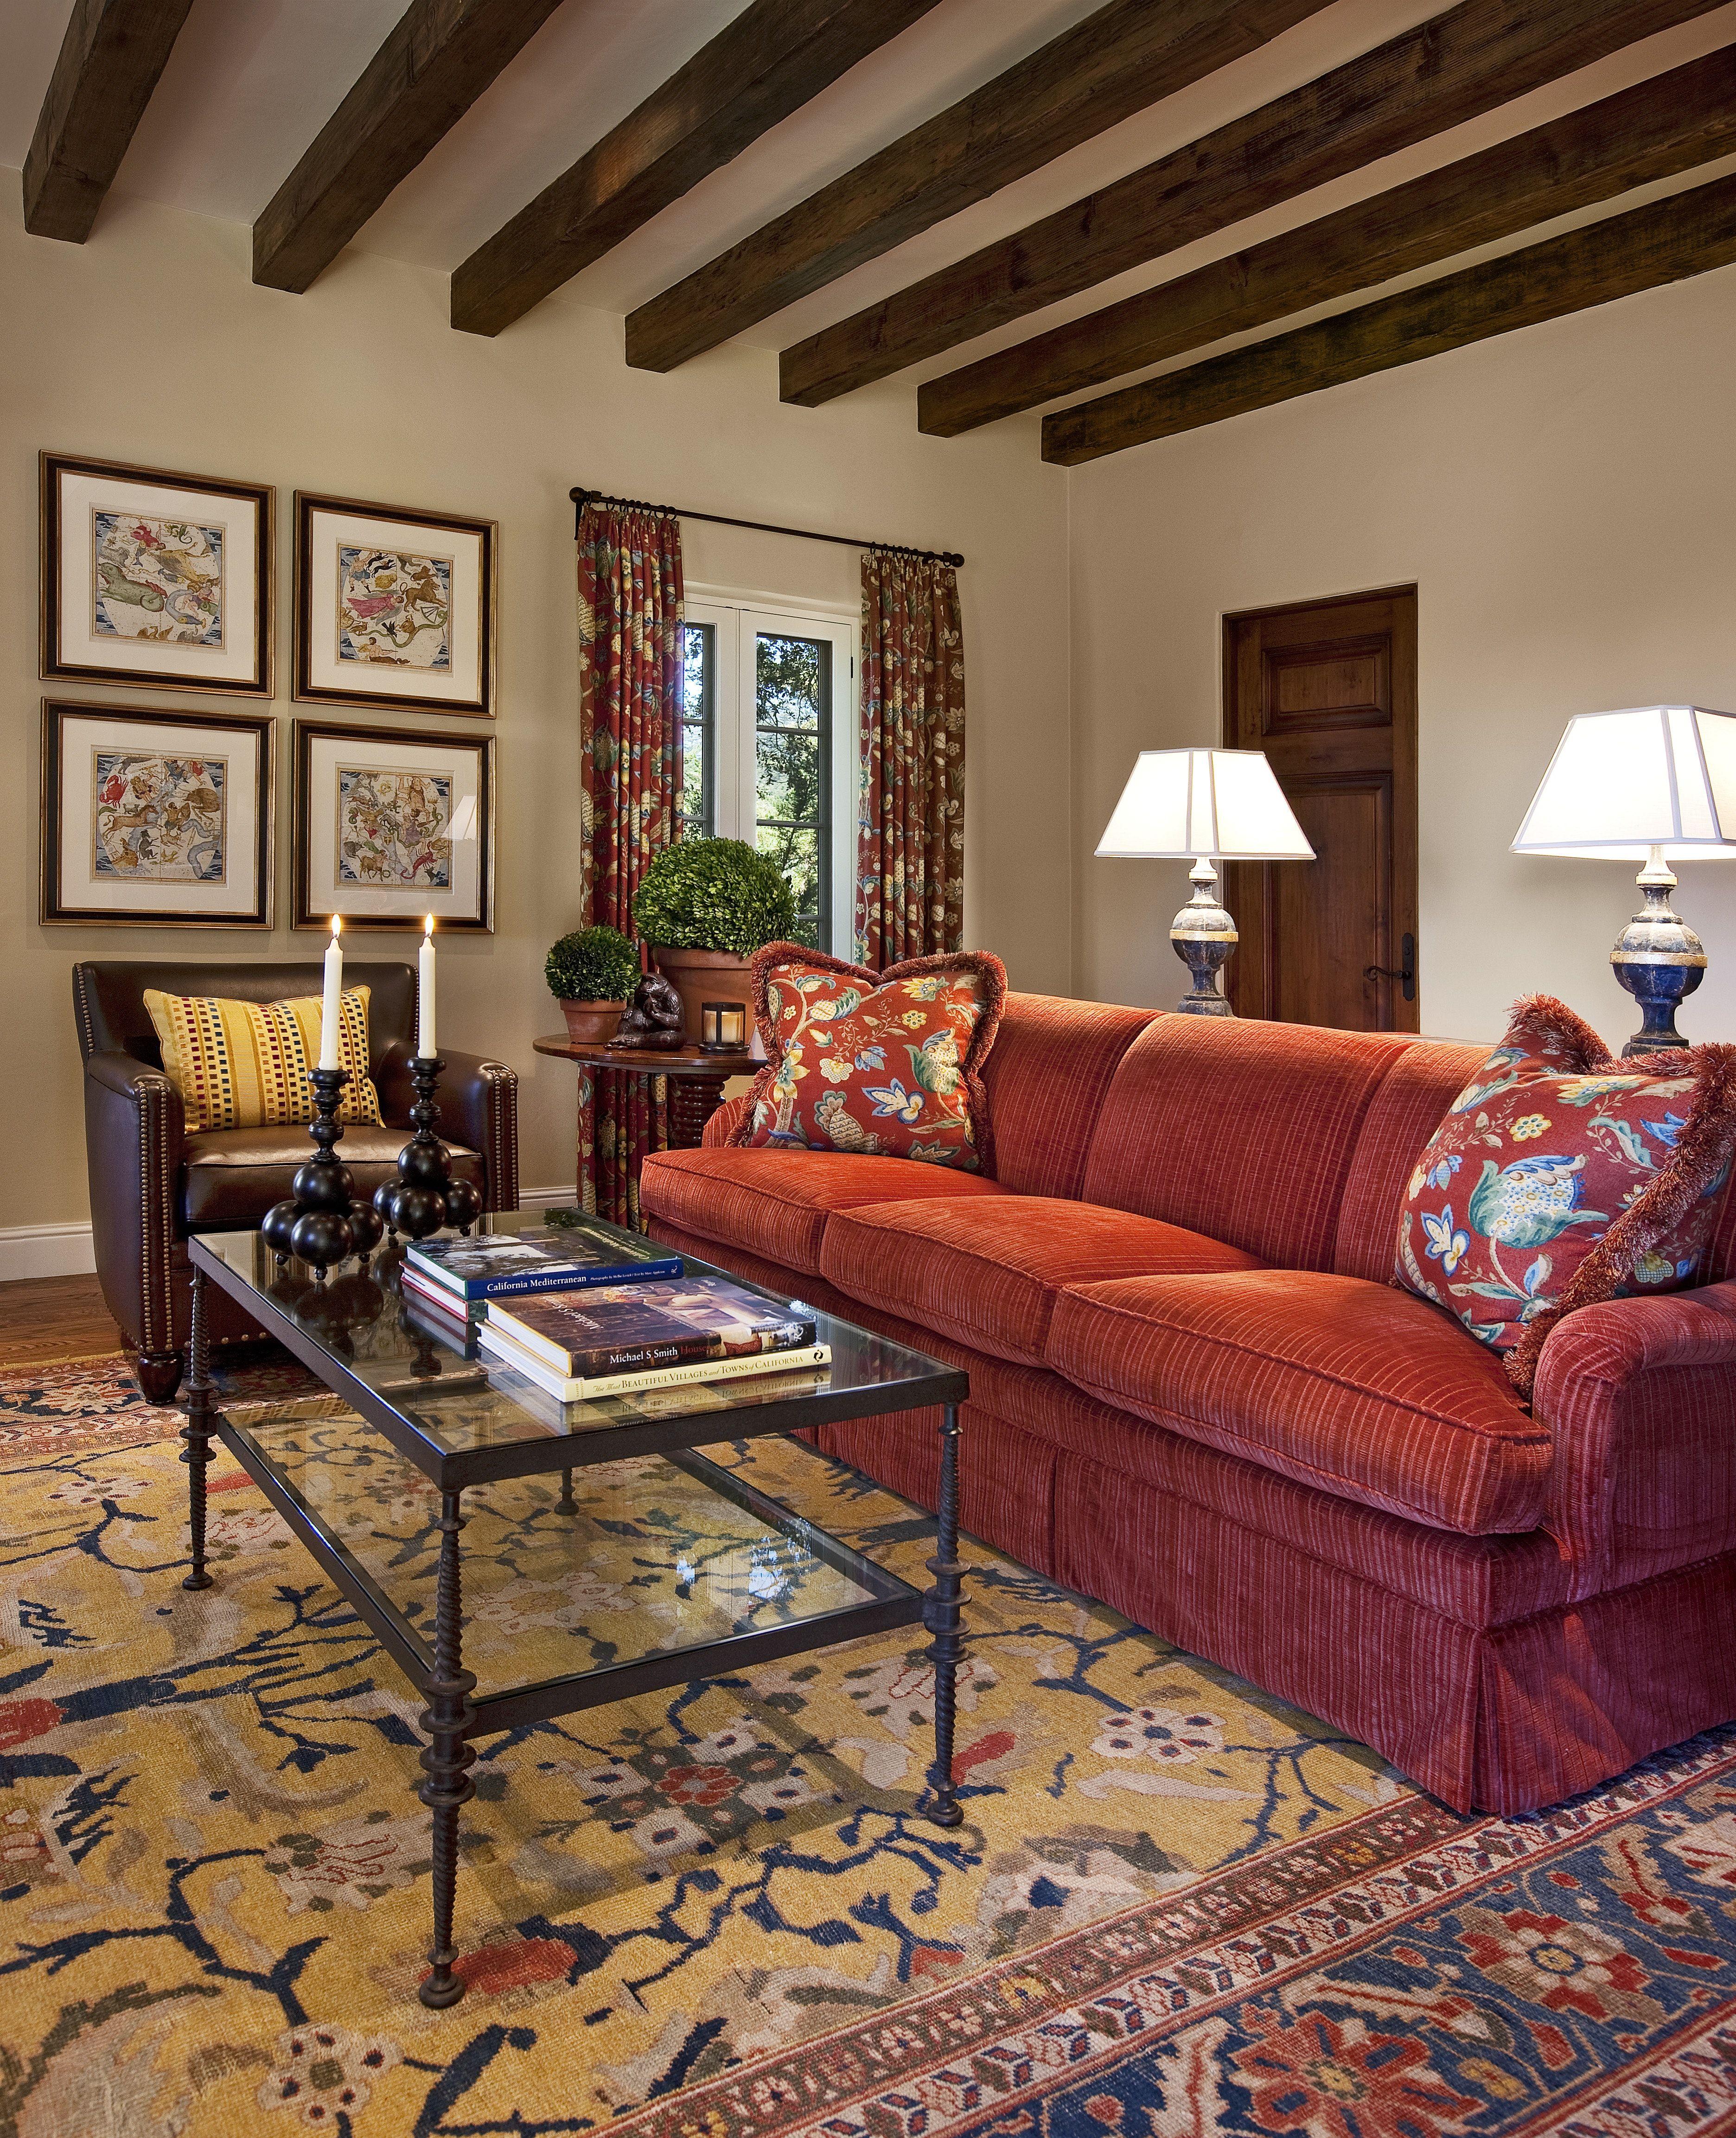 Fall Interior Decorating Ideas 2019 Mediterranean Mediterranean Living Room, Montecito, California   A Pretty Liv rm